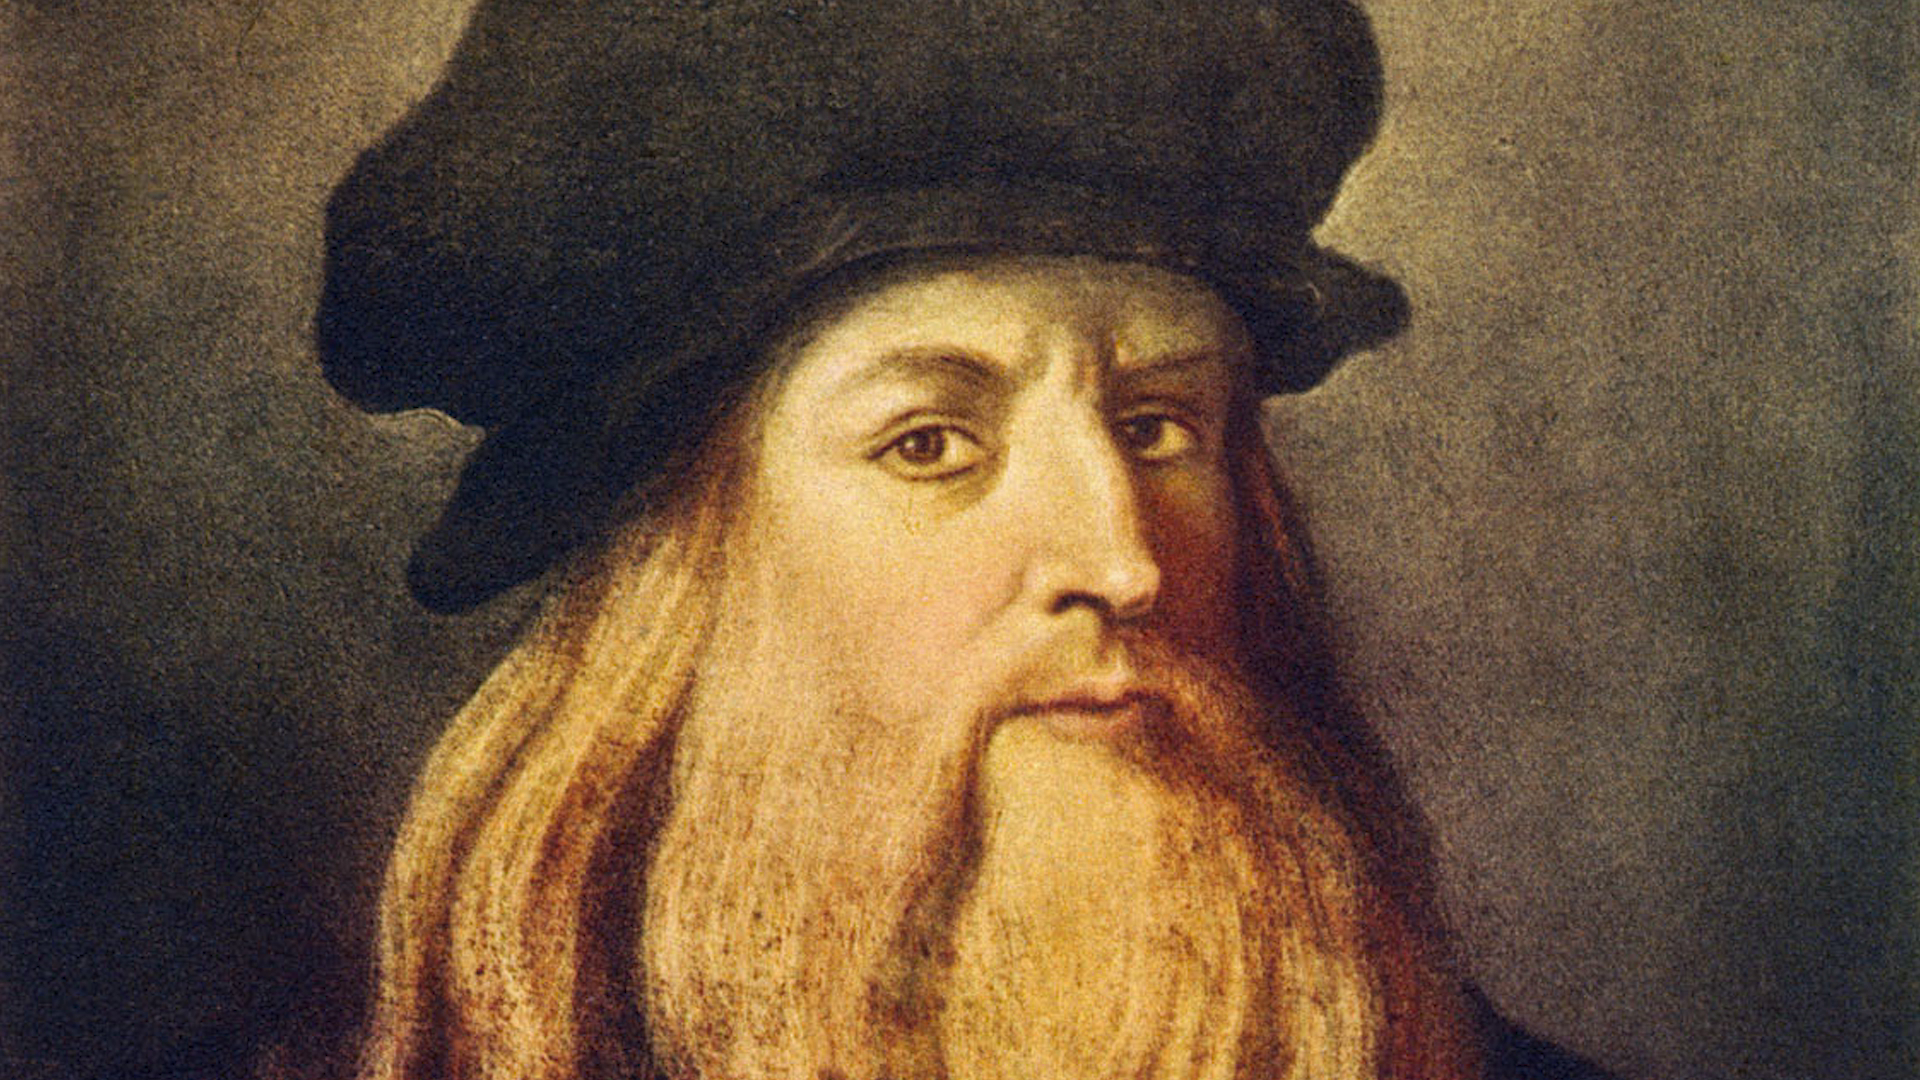 An Overview Of The Life And Art Of Leonardo Da Vinci